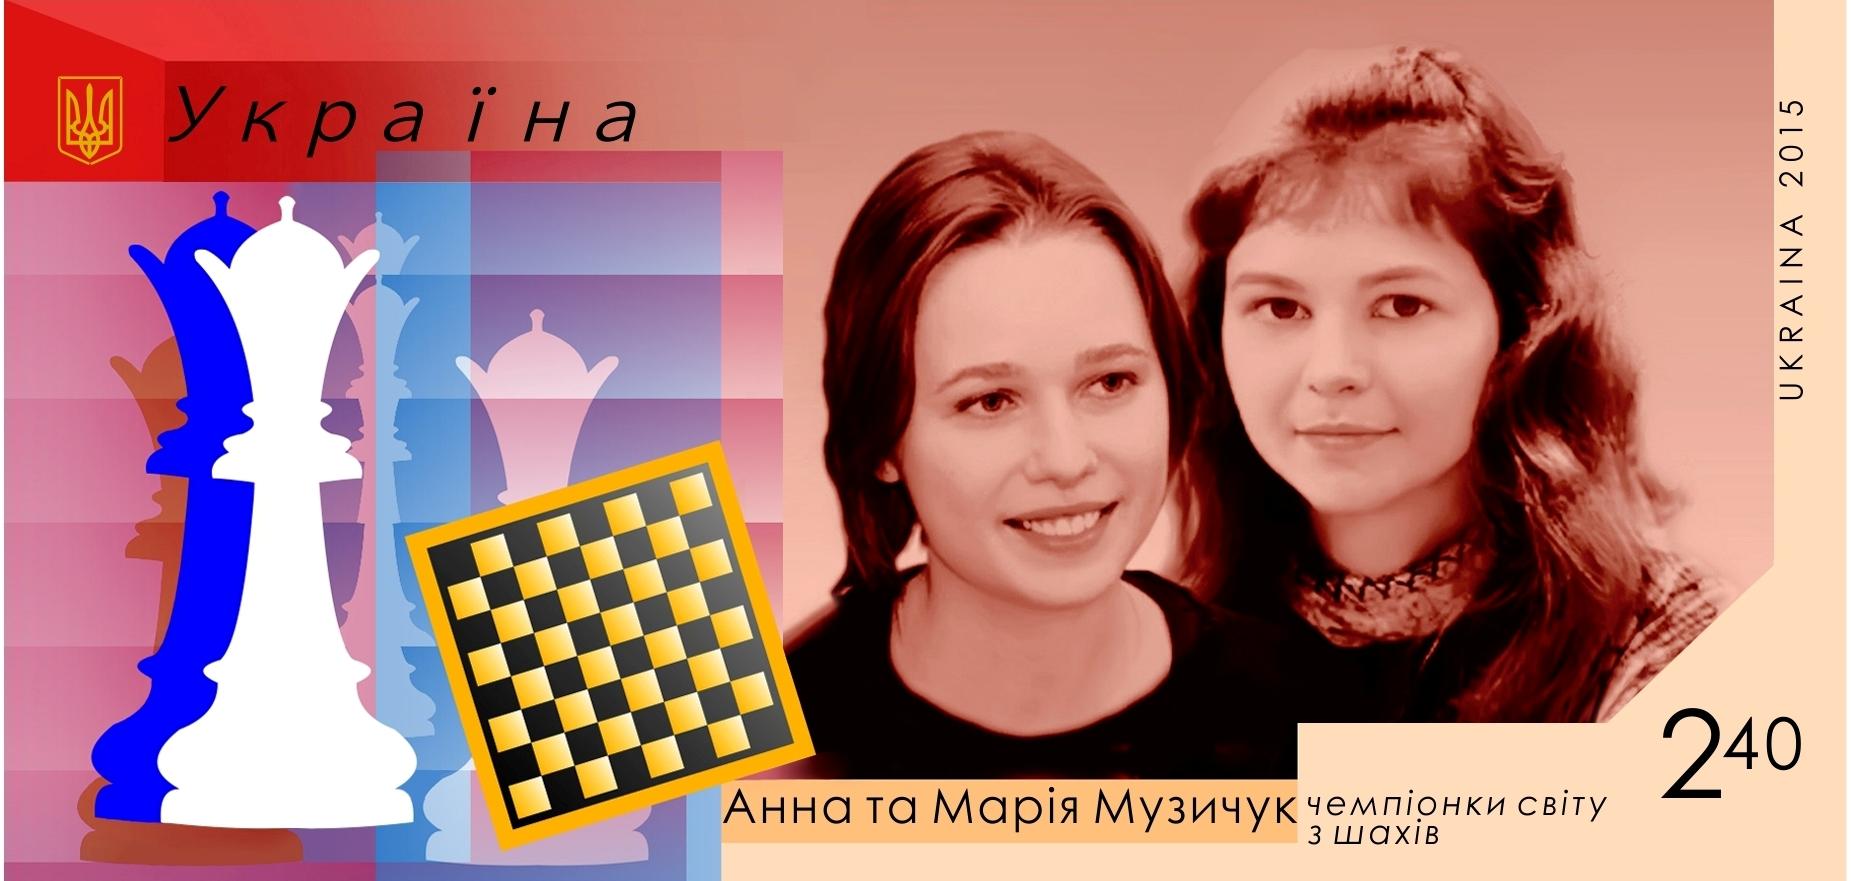 Muzhych stamp (3)